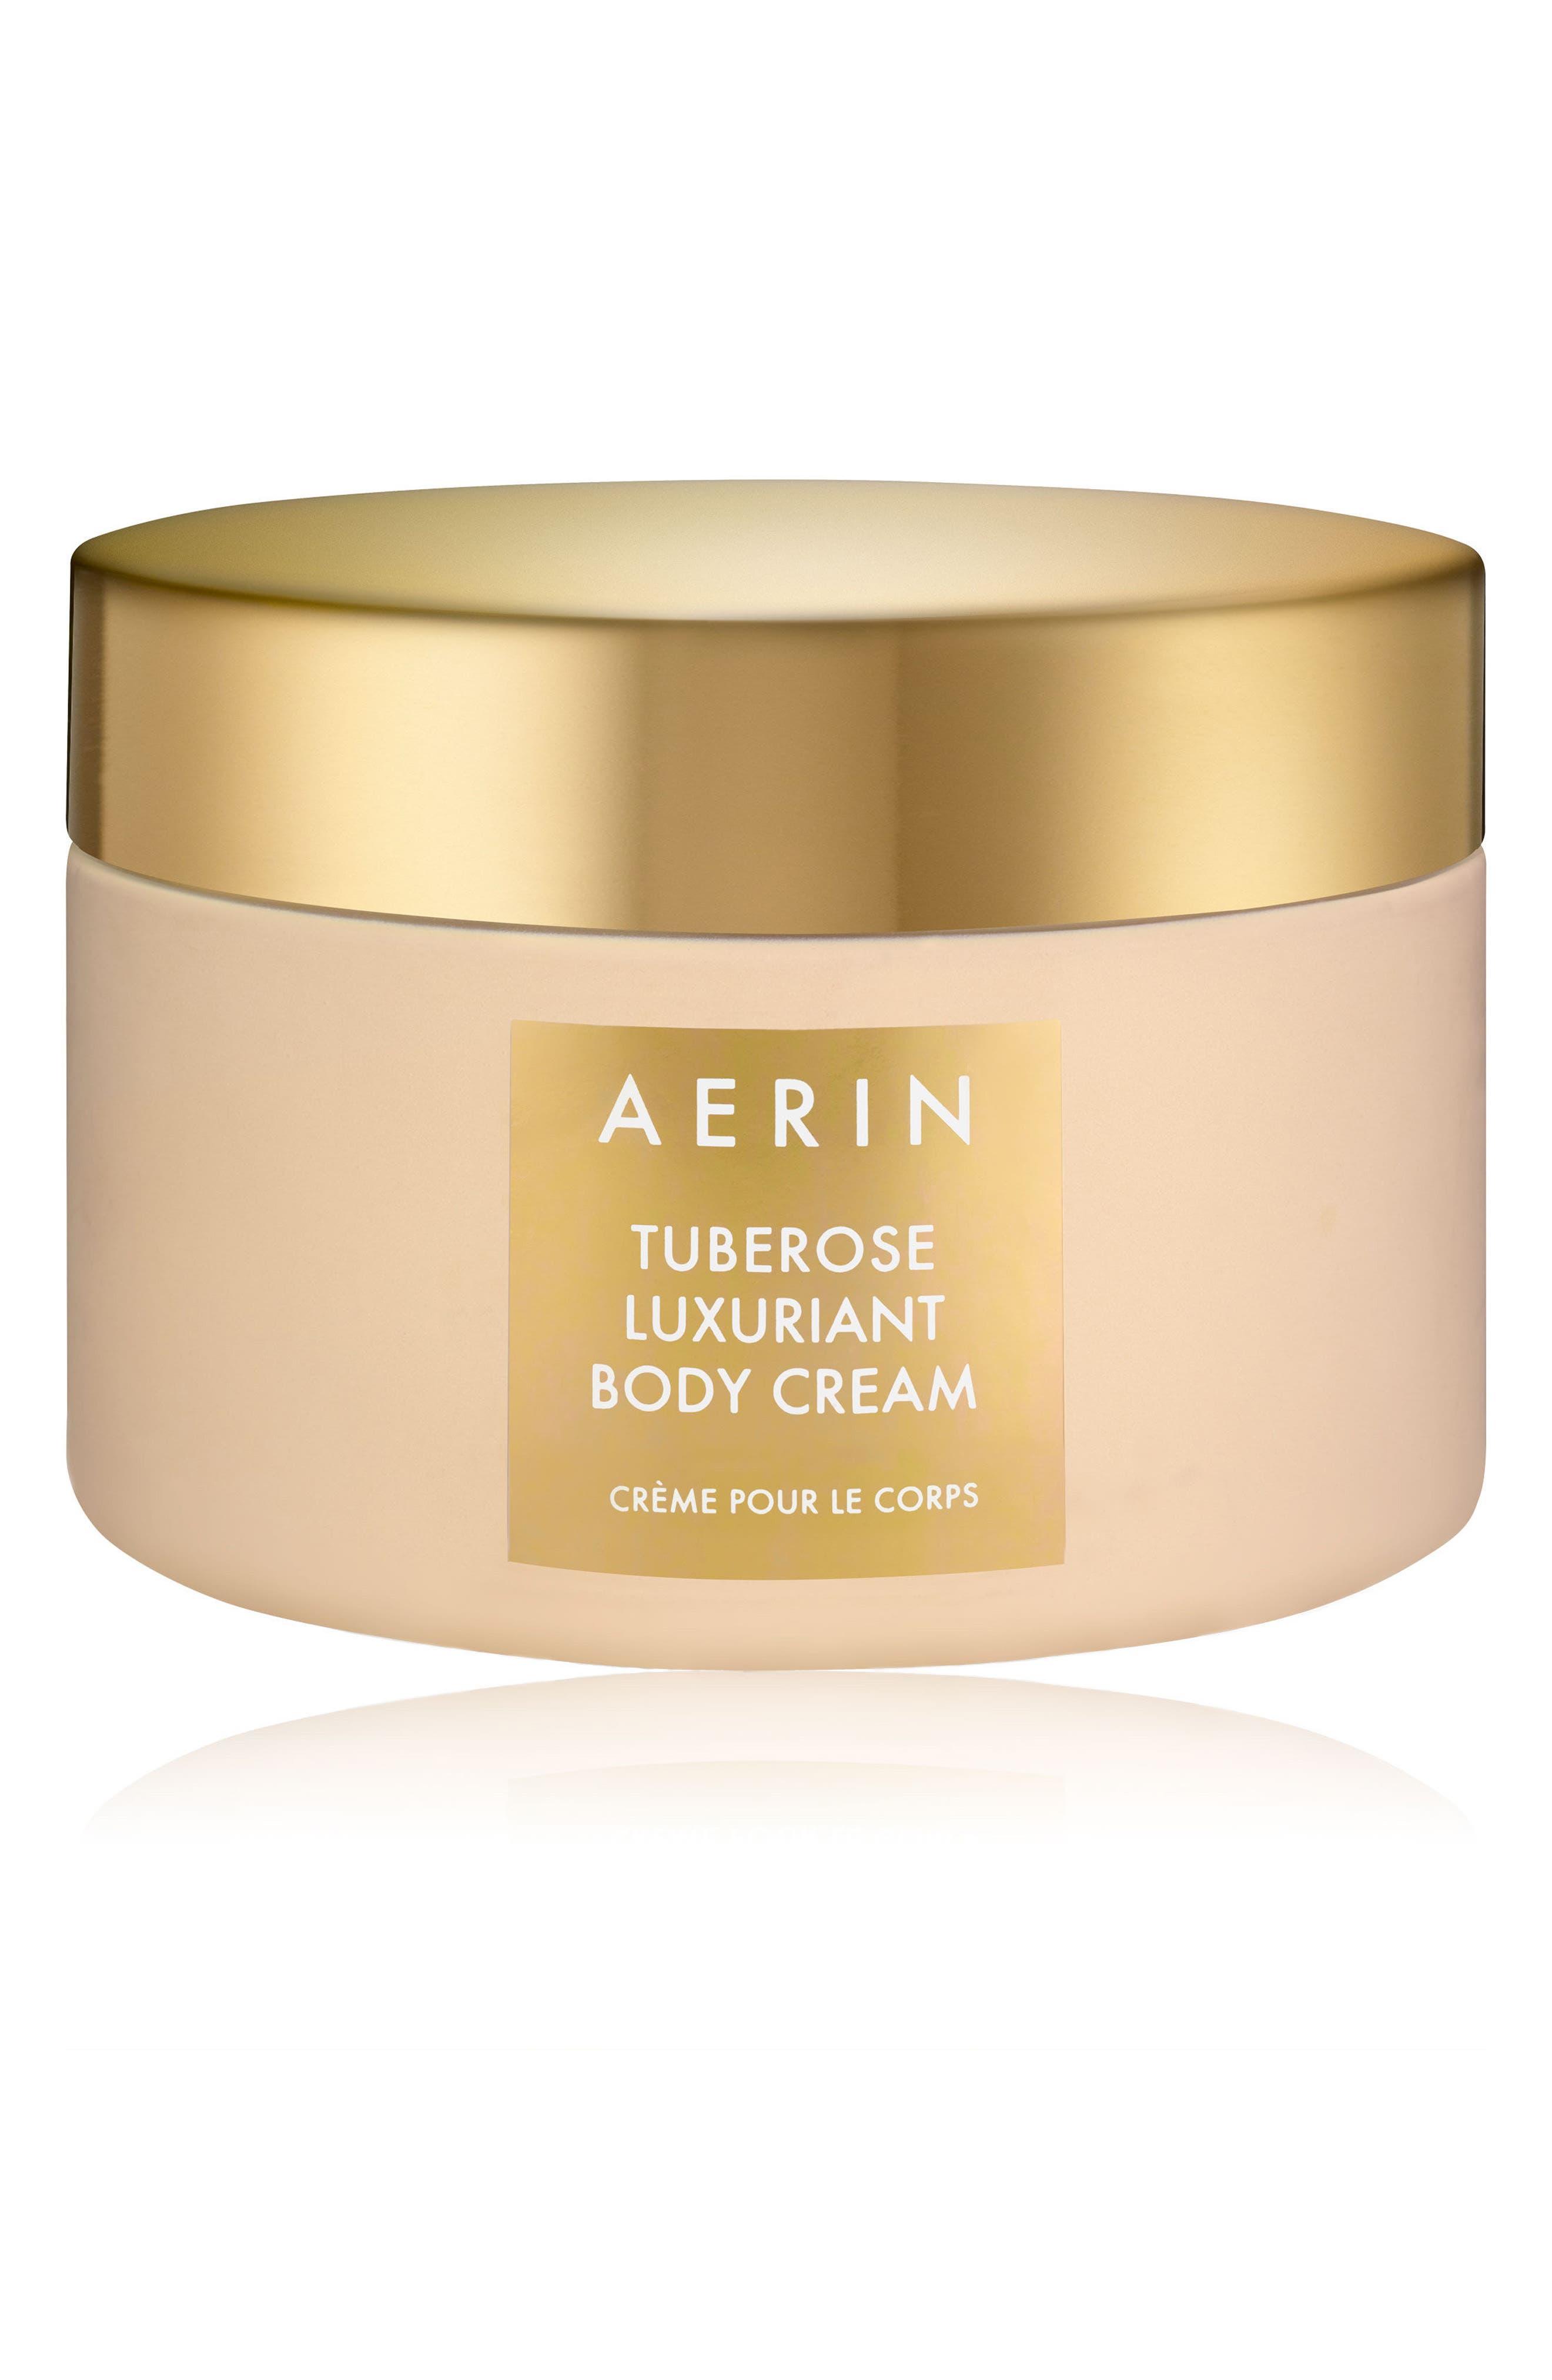 AERIN Beauty Tuberose Luxuriant Body Cream,                         Main,                         color,